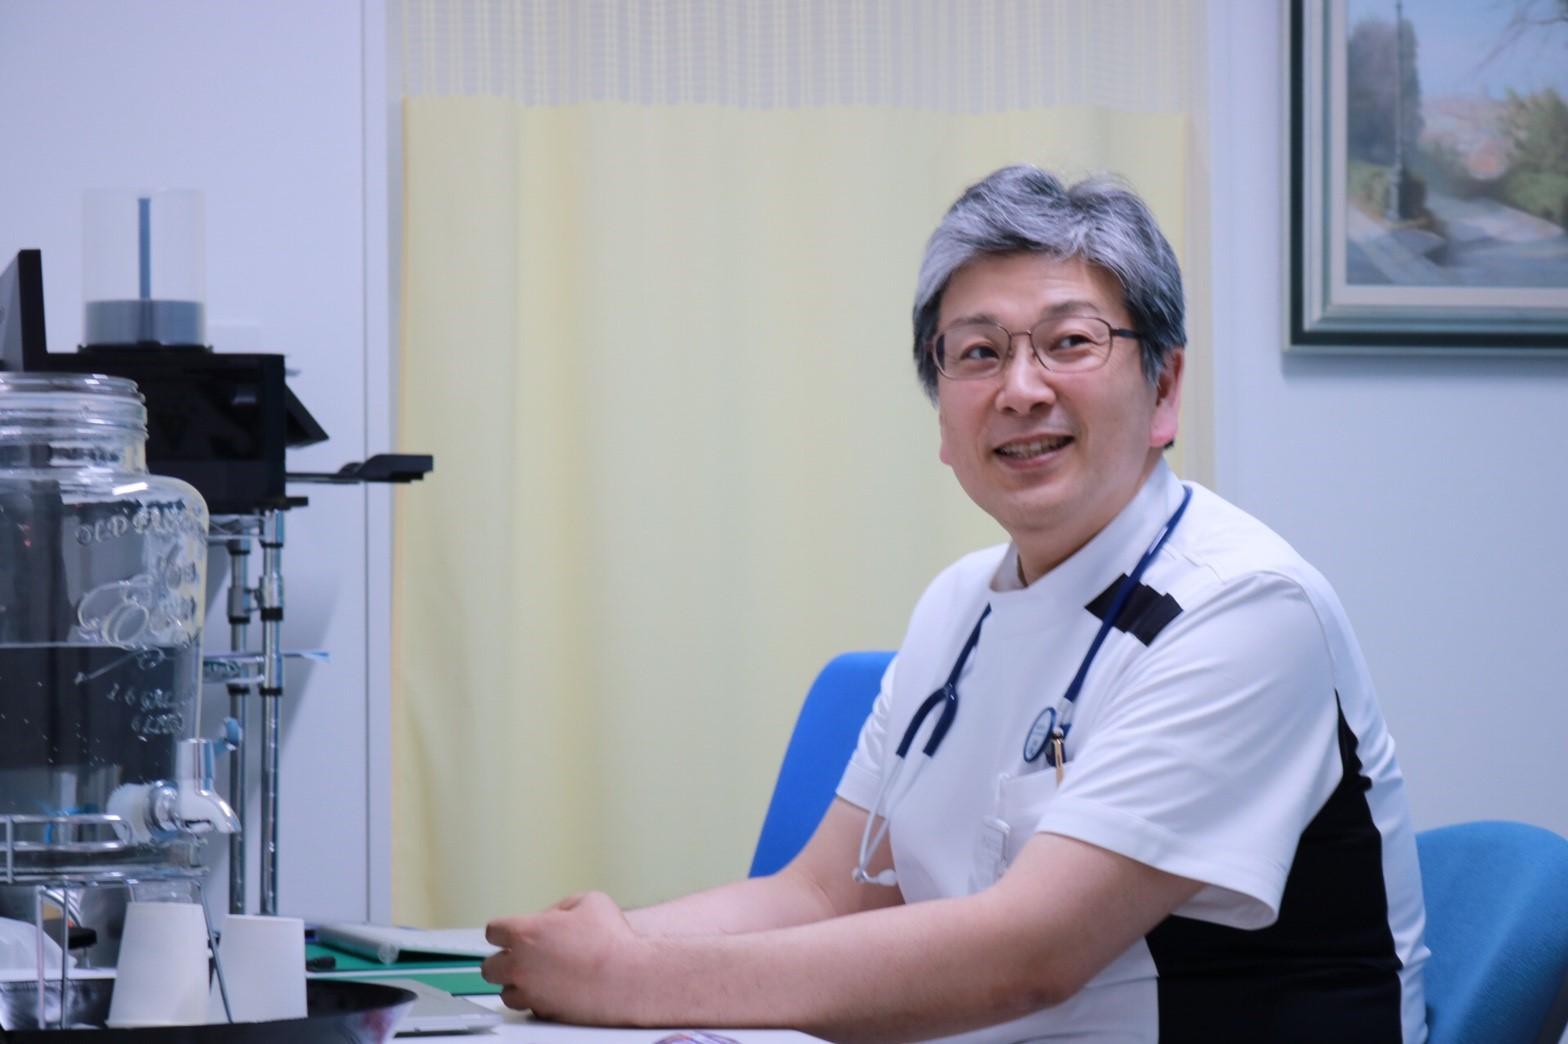 Dr. KAWANISHI